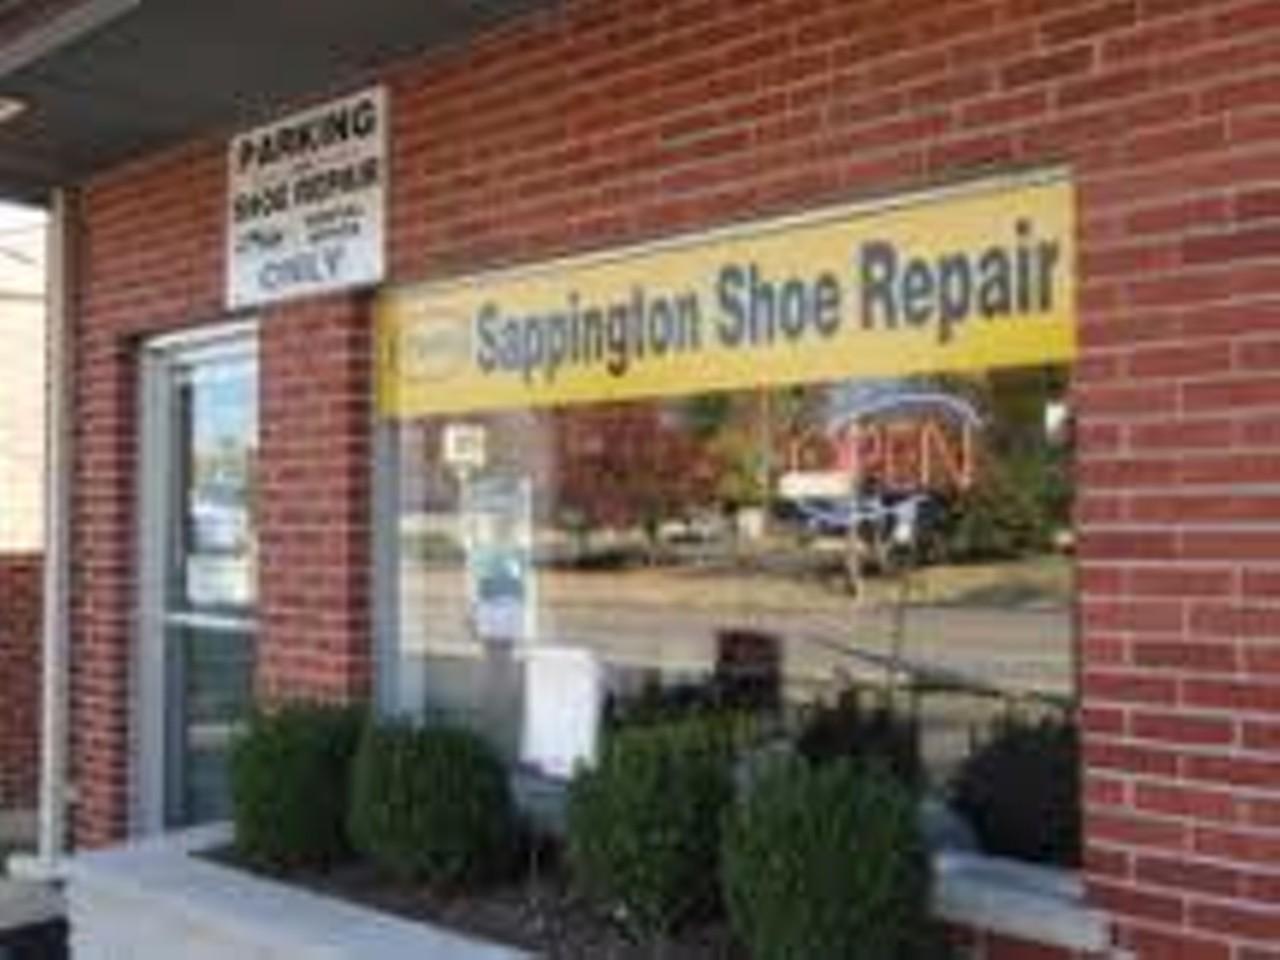 St Louis Shoe Repair Shops